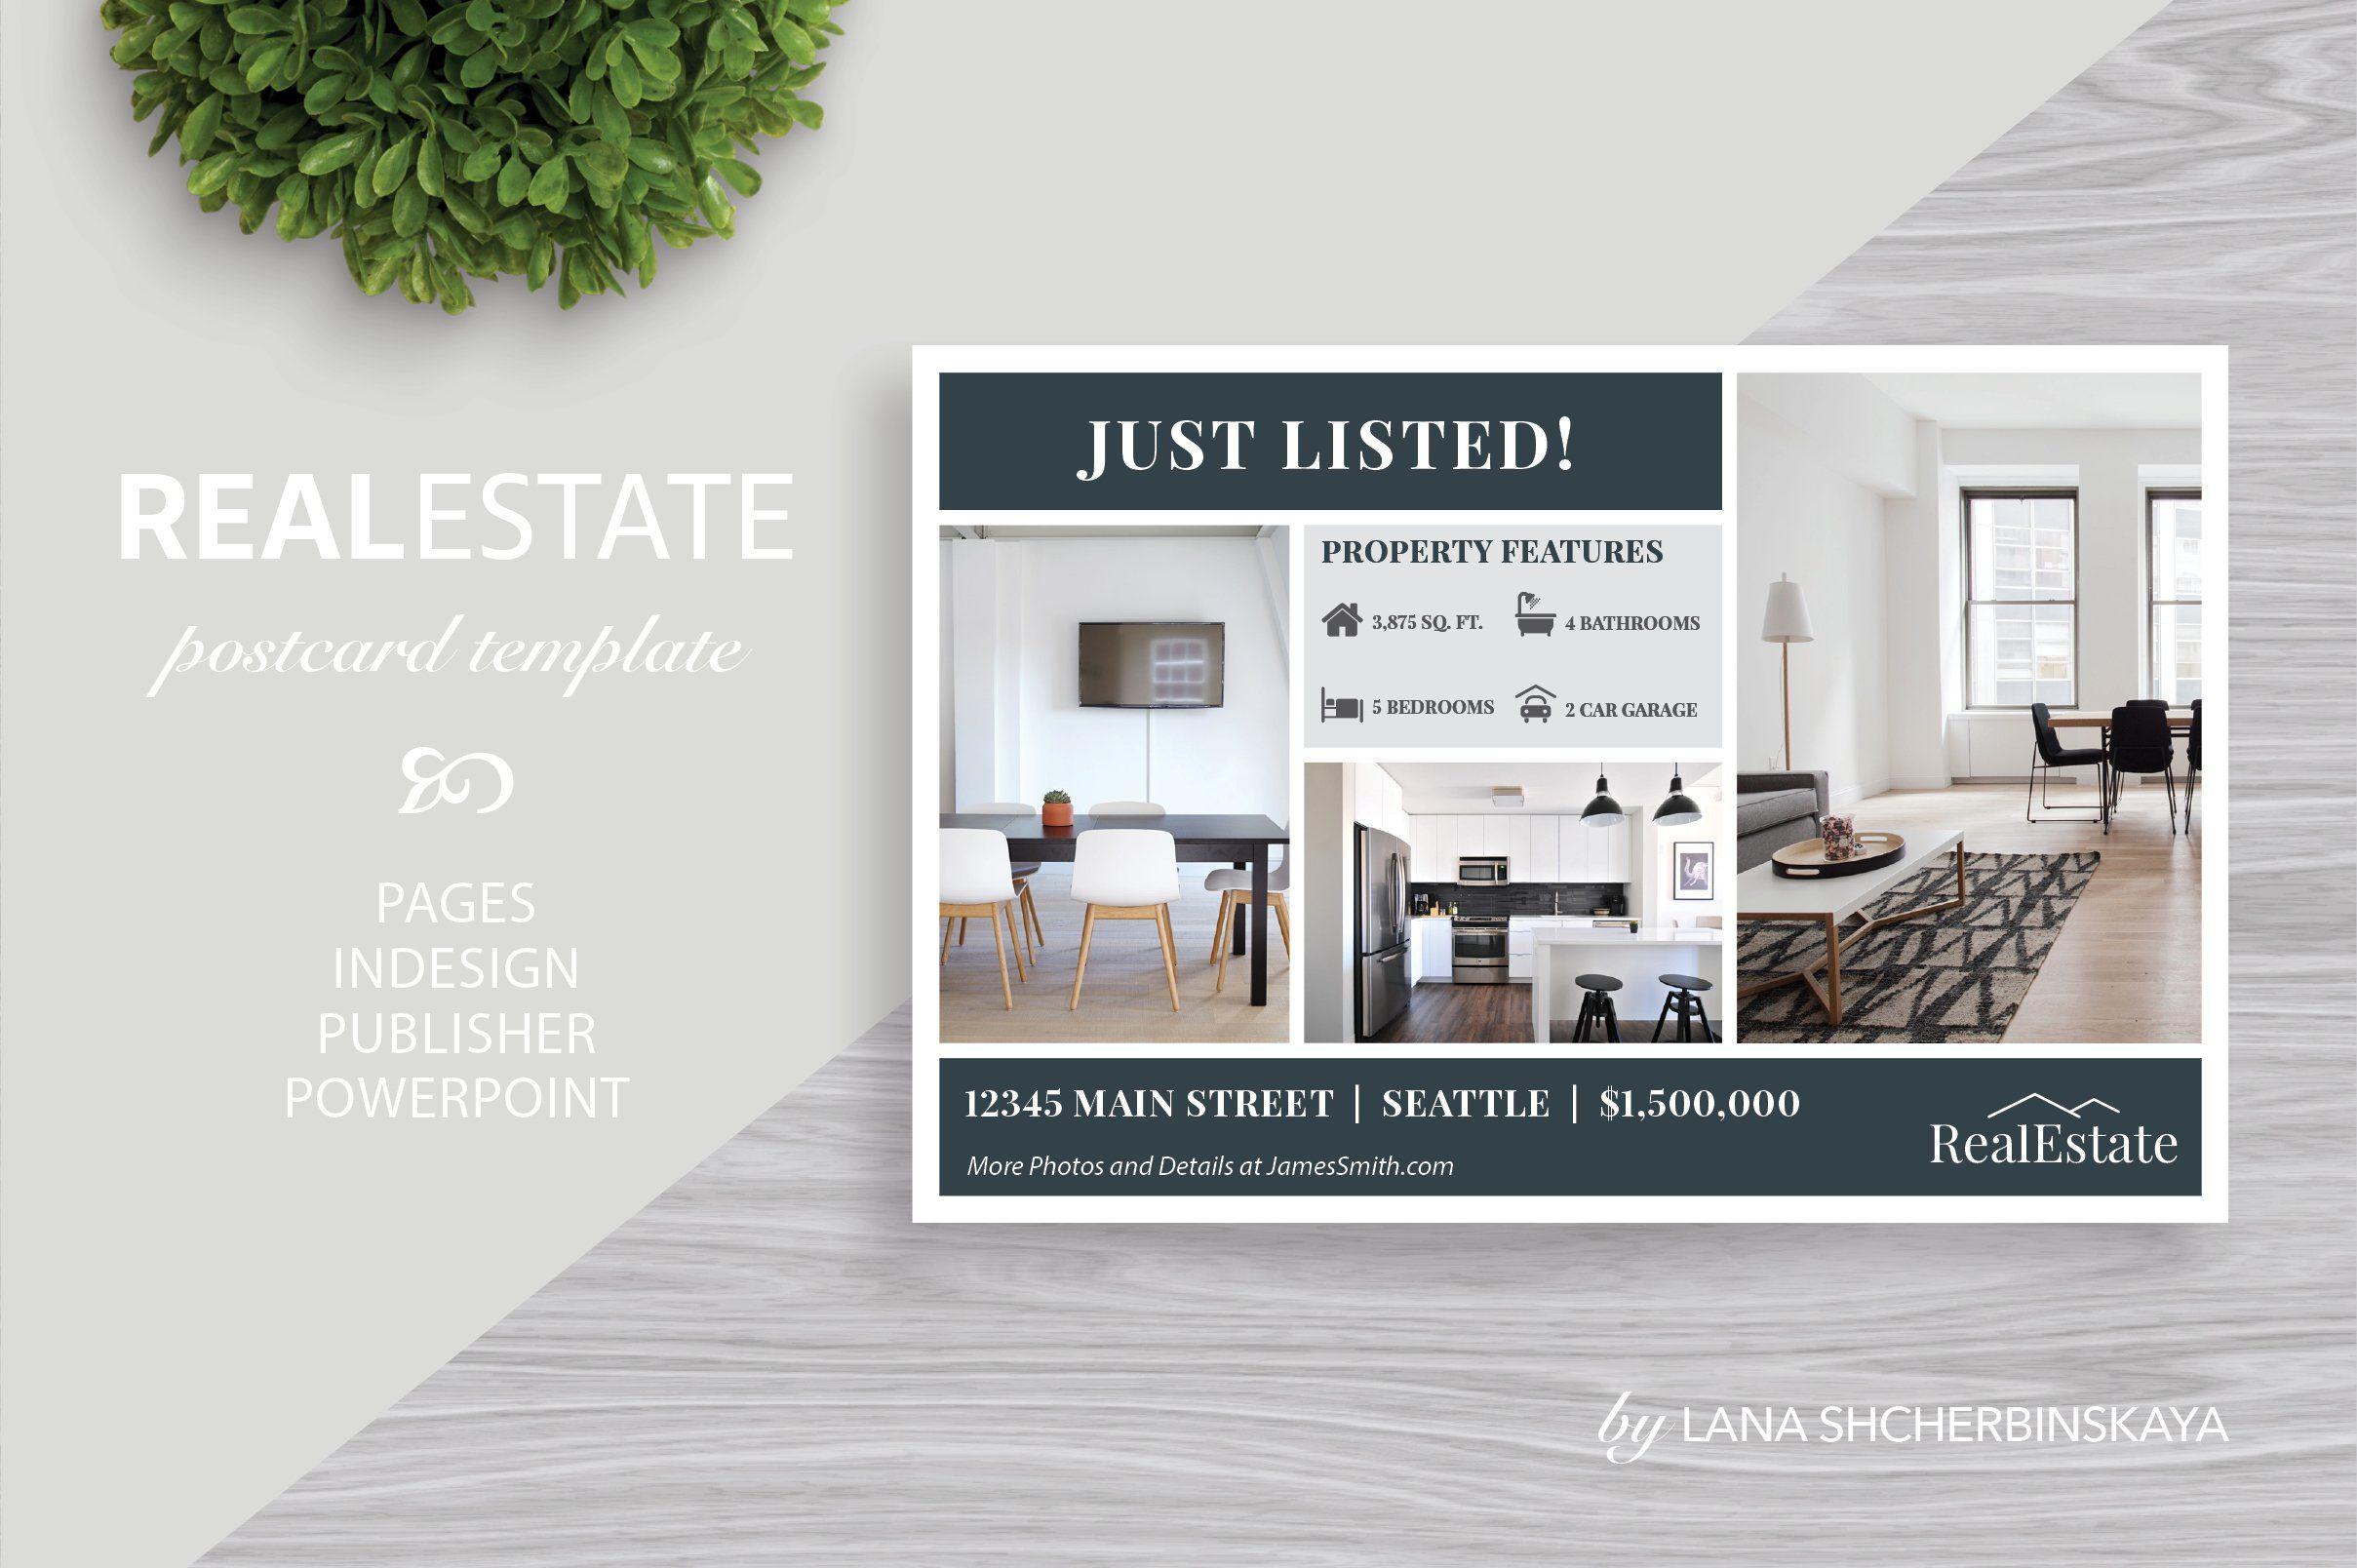 Real Estate Postcard Template No 1 Real Estate Postcards